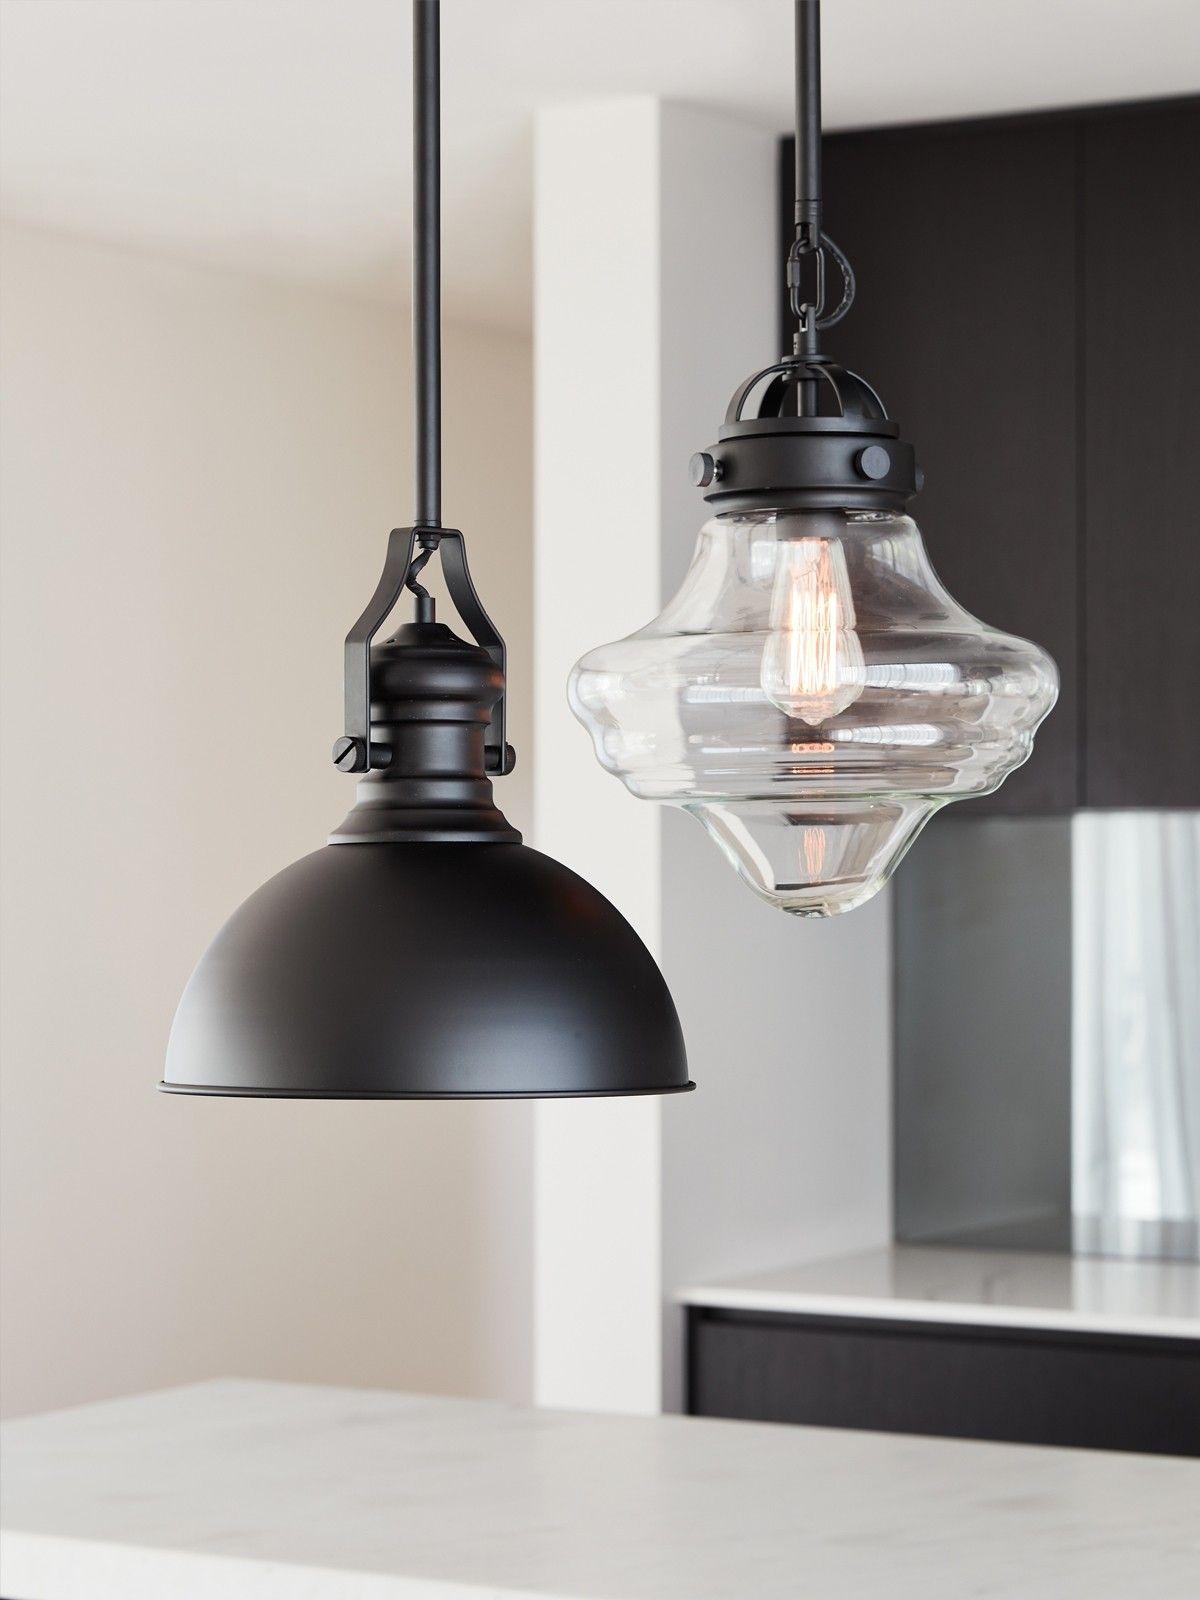 Hamilton 1 Light Pendant in Black Black pendant light